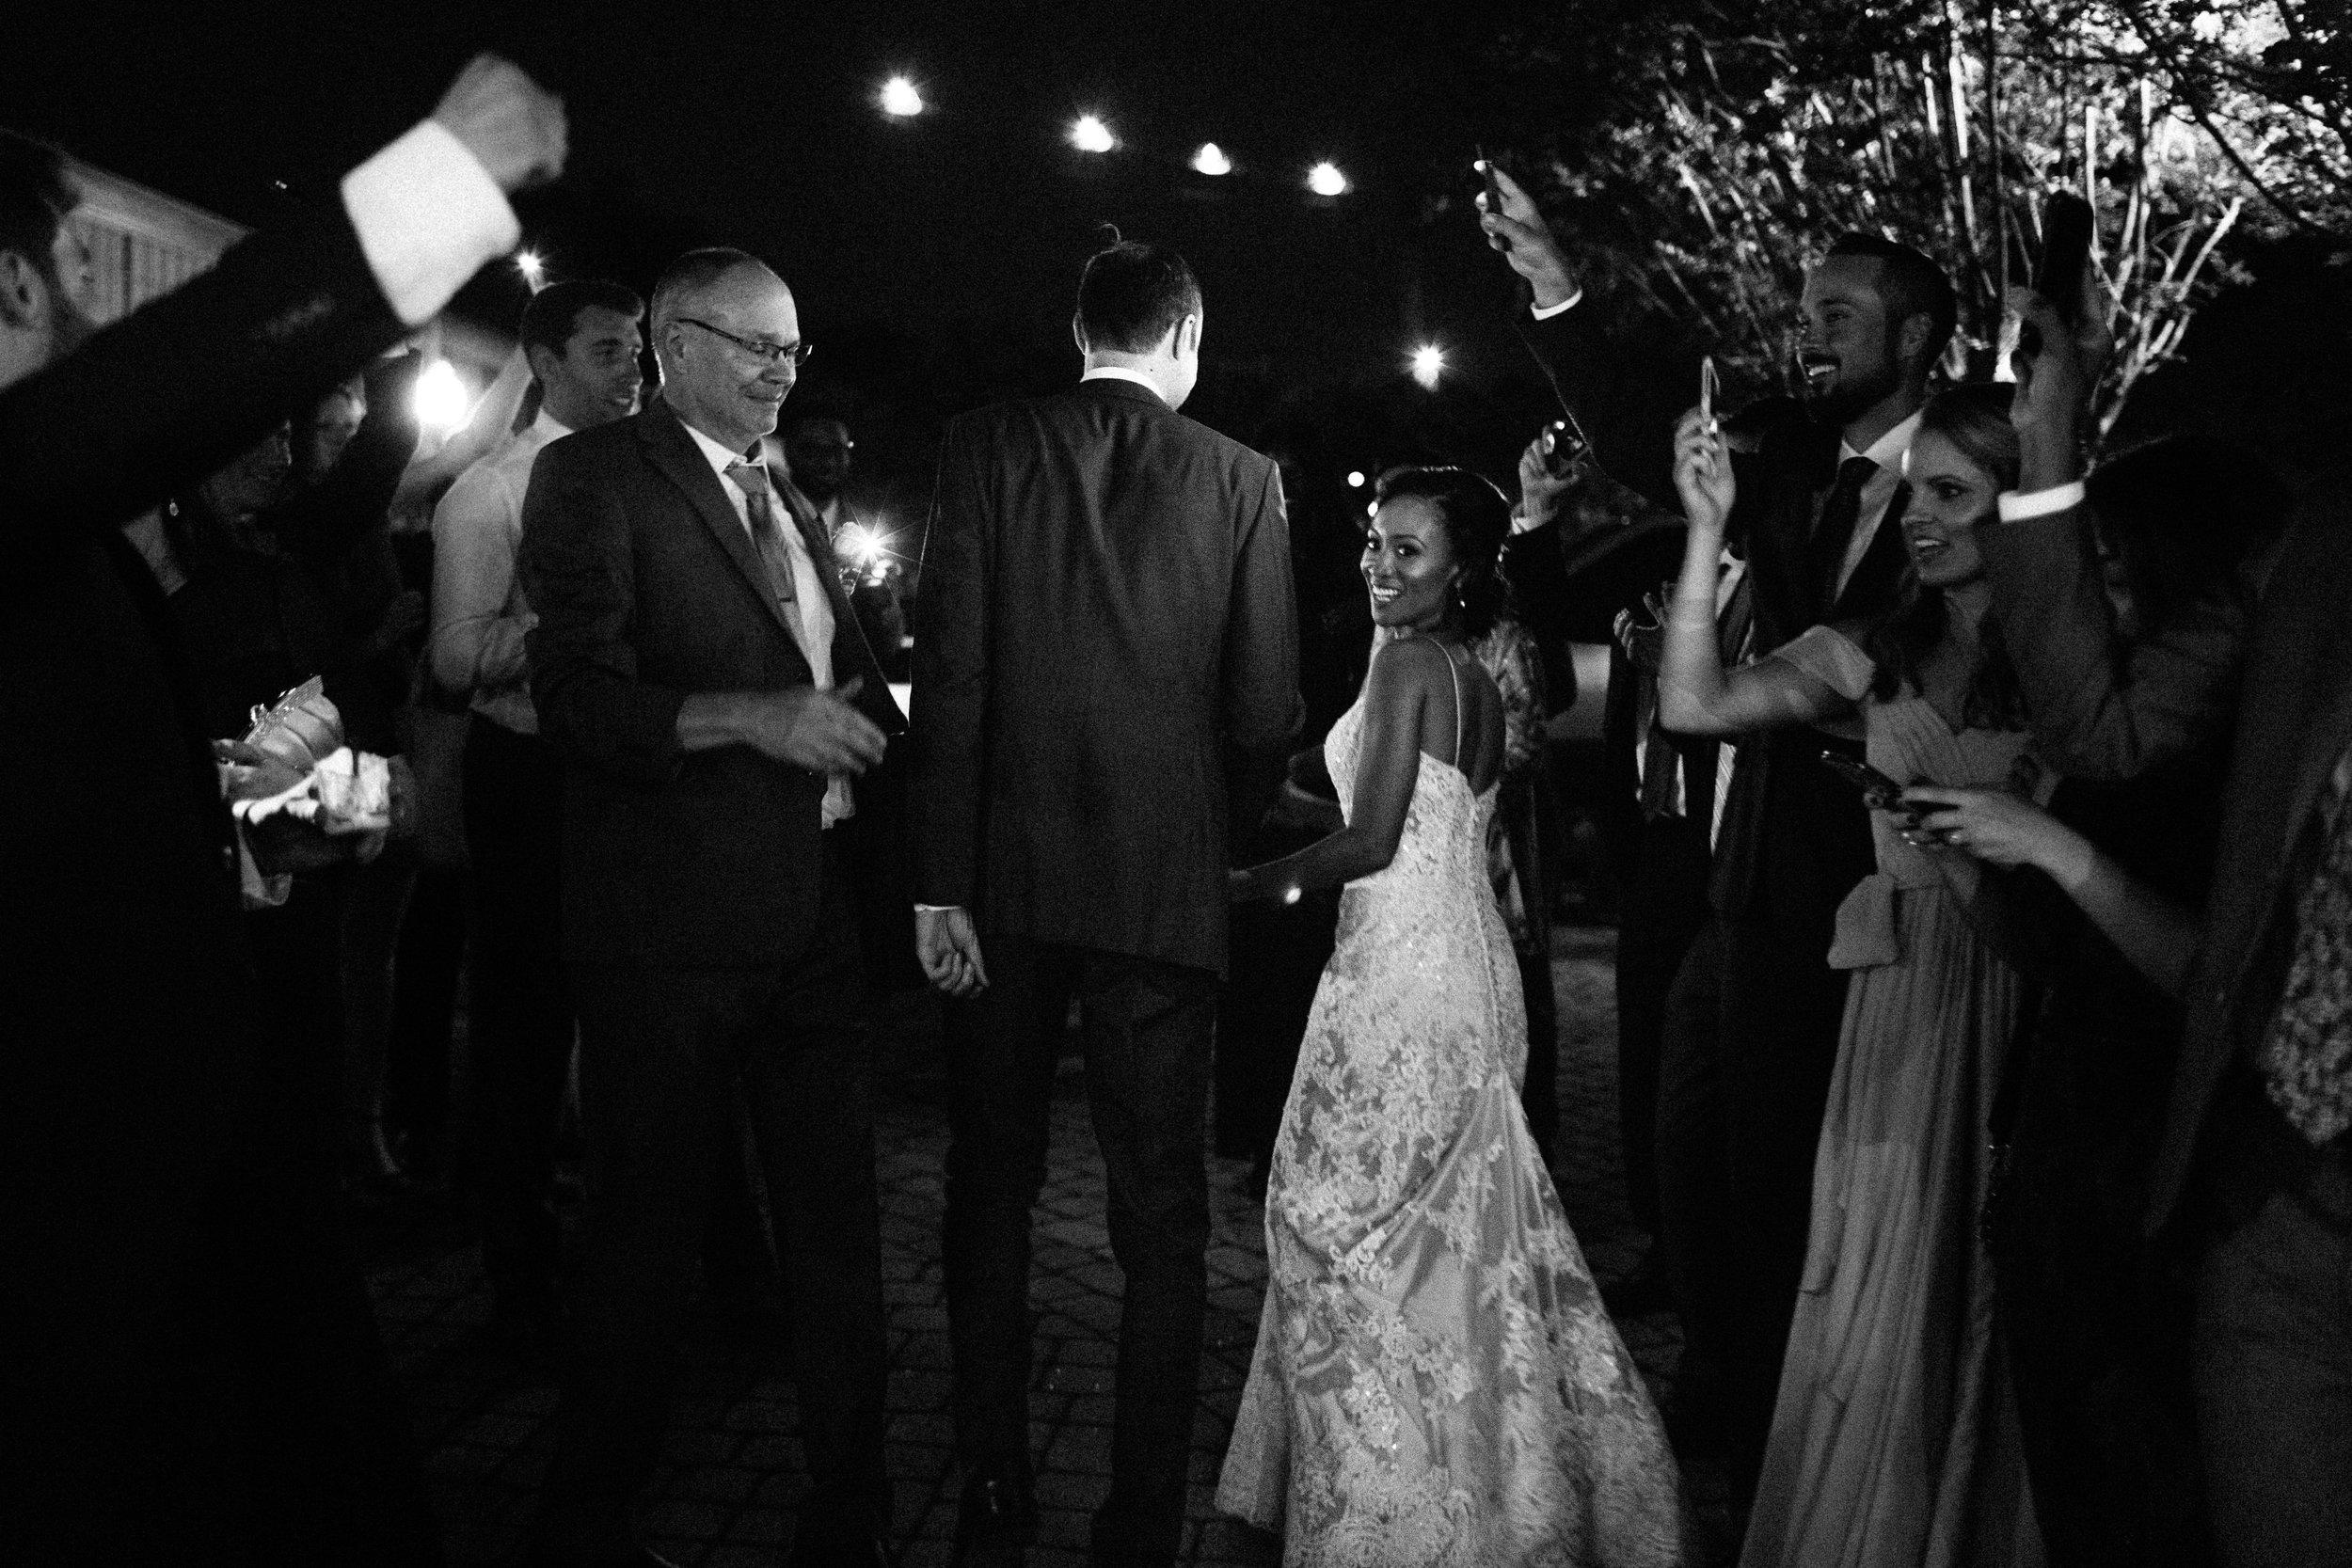 king_plow_atlanta_wedding_art_gallery_modern_lifestyle_documentary_2114.jpg